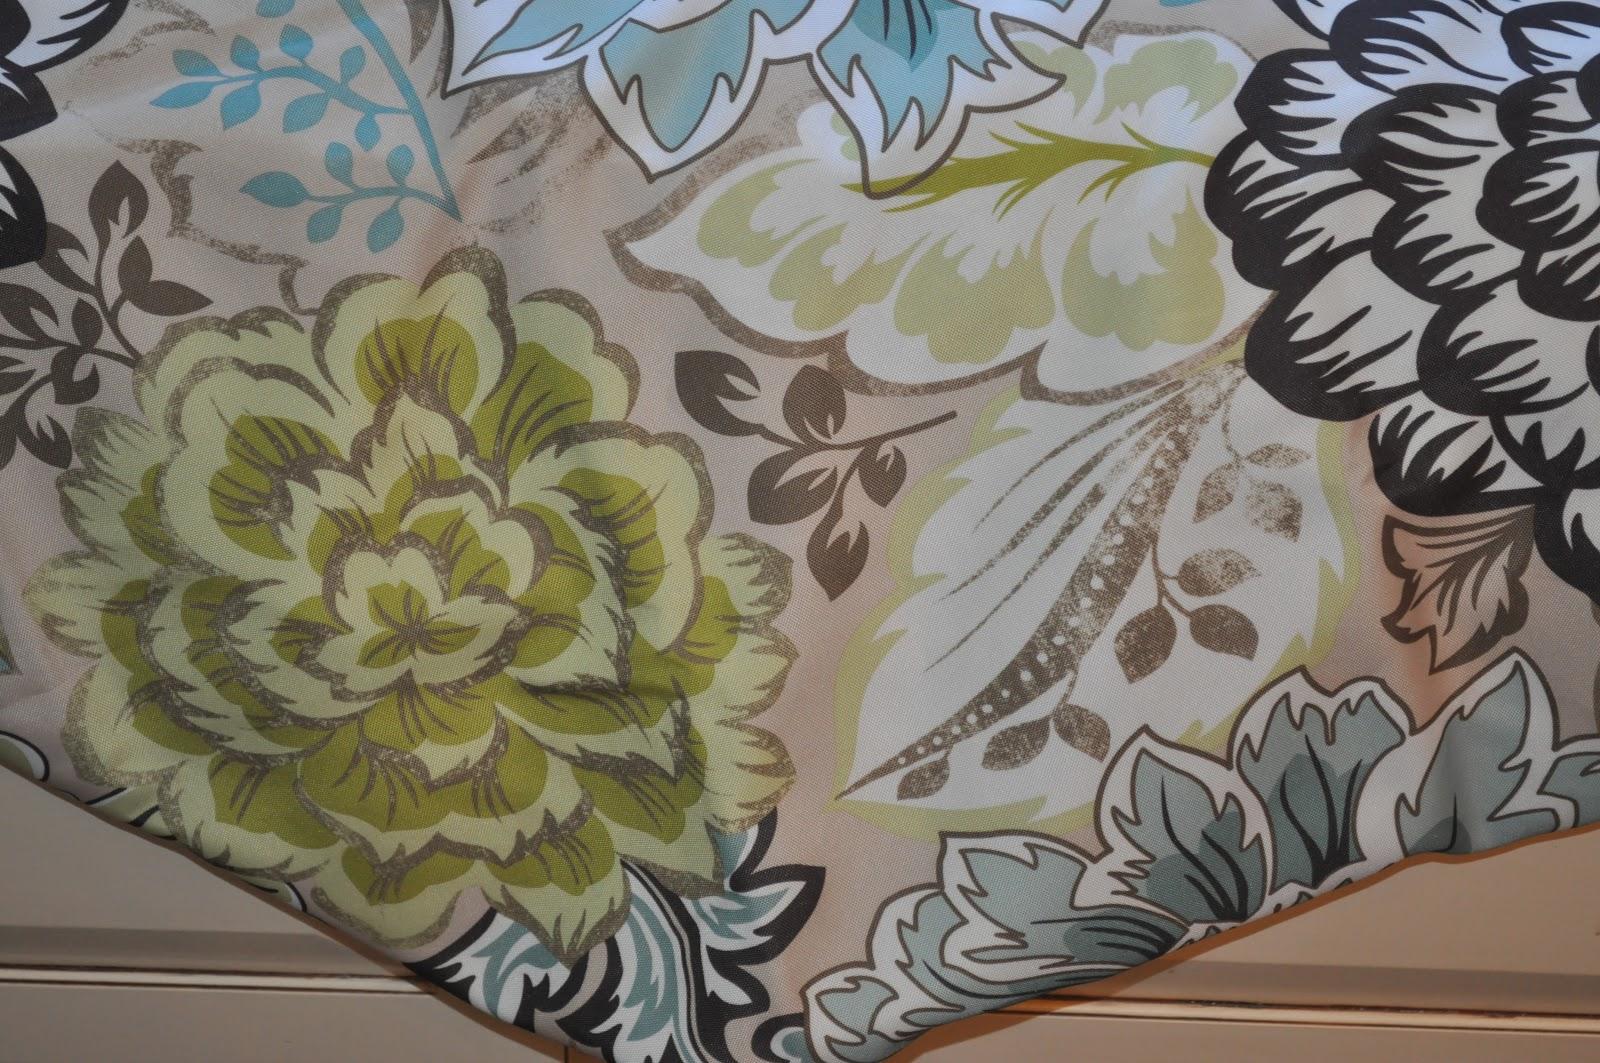 Free Download Bold Floral Print Wallpaper I Wanted A Big Bold